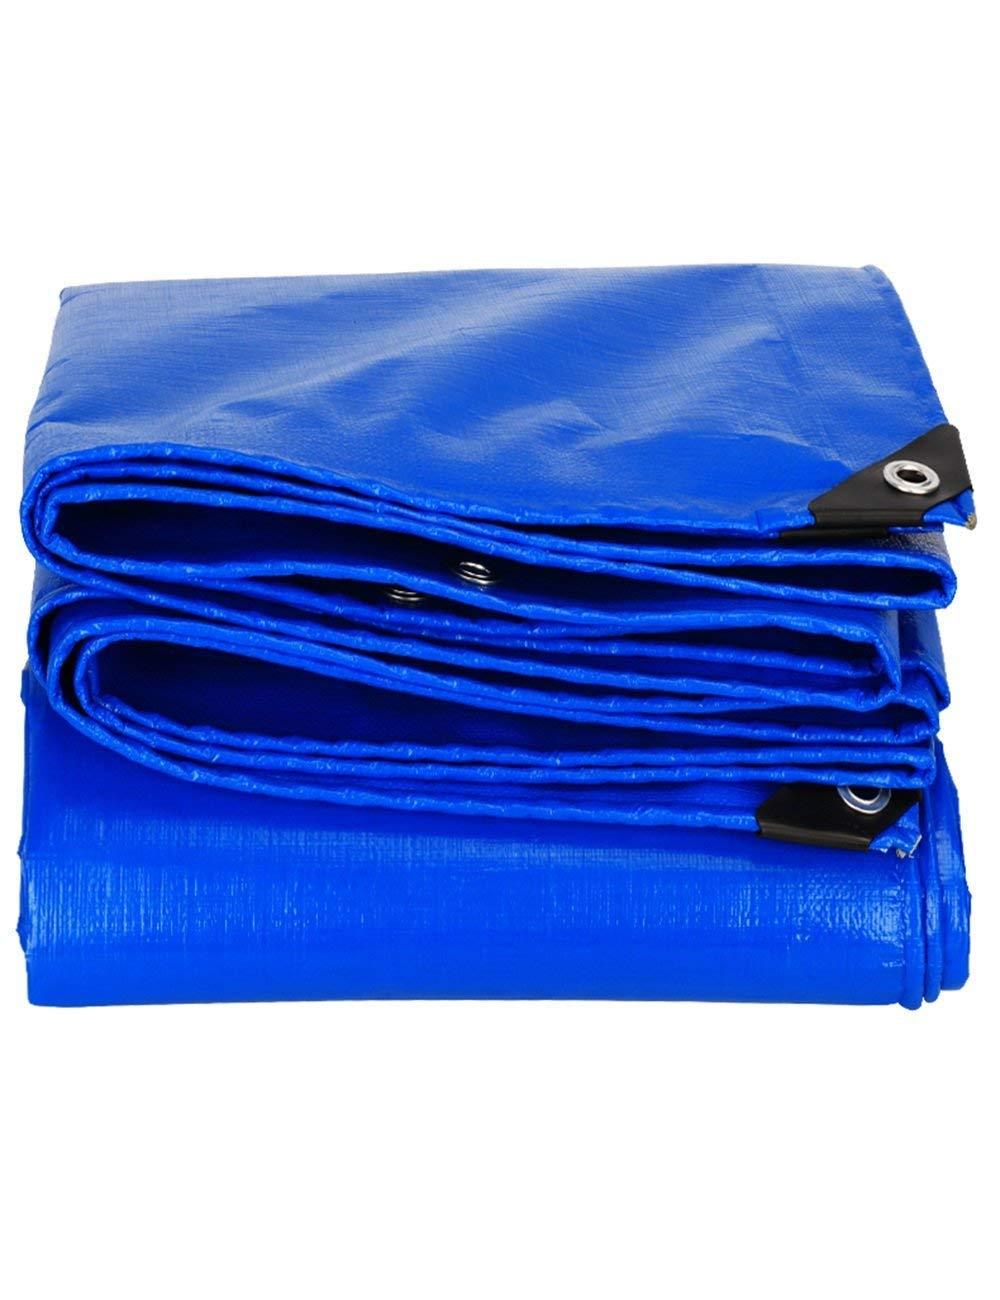 Fonly Blau Verdicken Plane Canvas Cover wasserdicht Tarp Zelt Camping Schatten Tarp